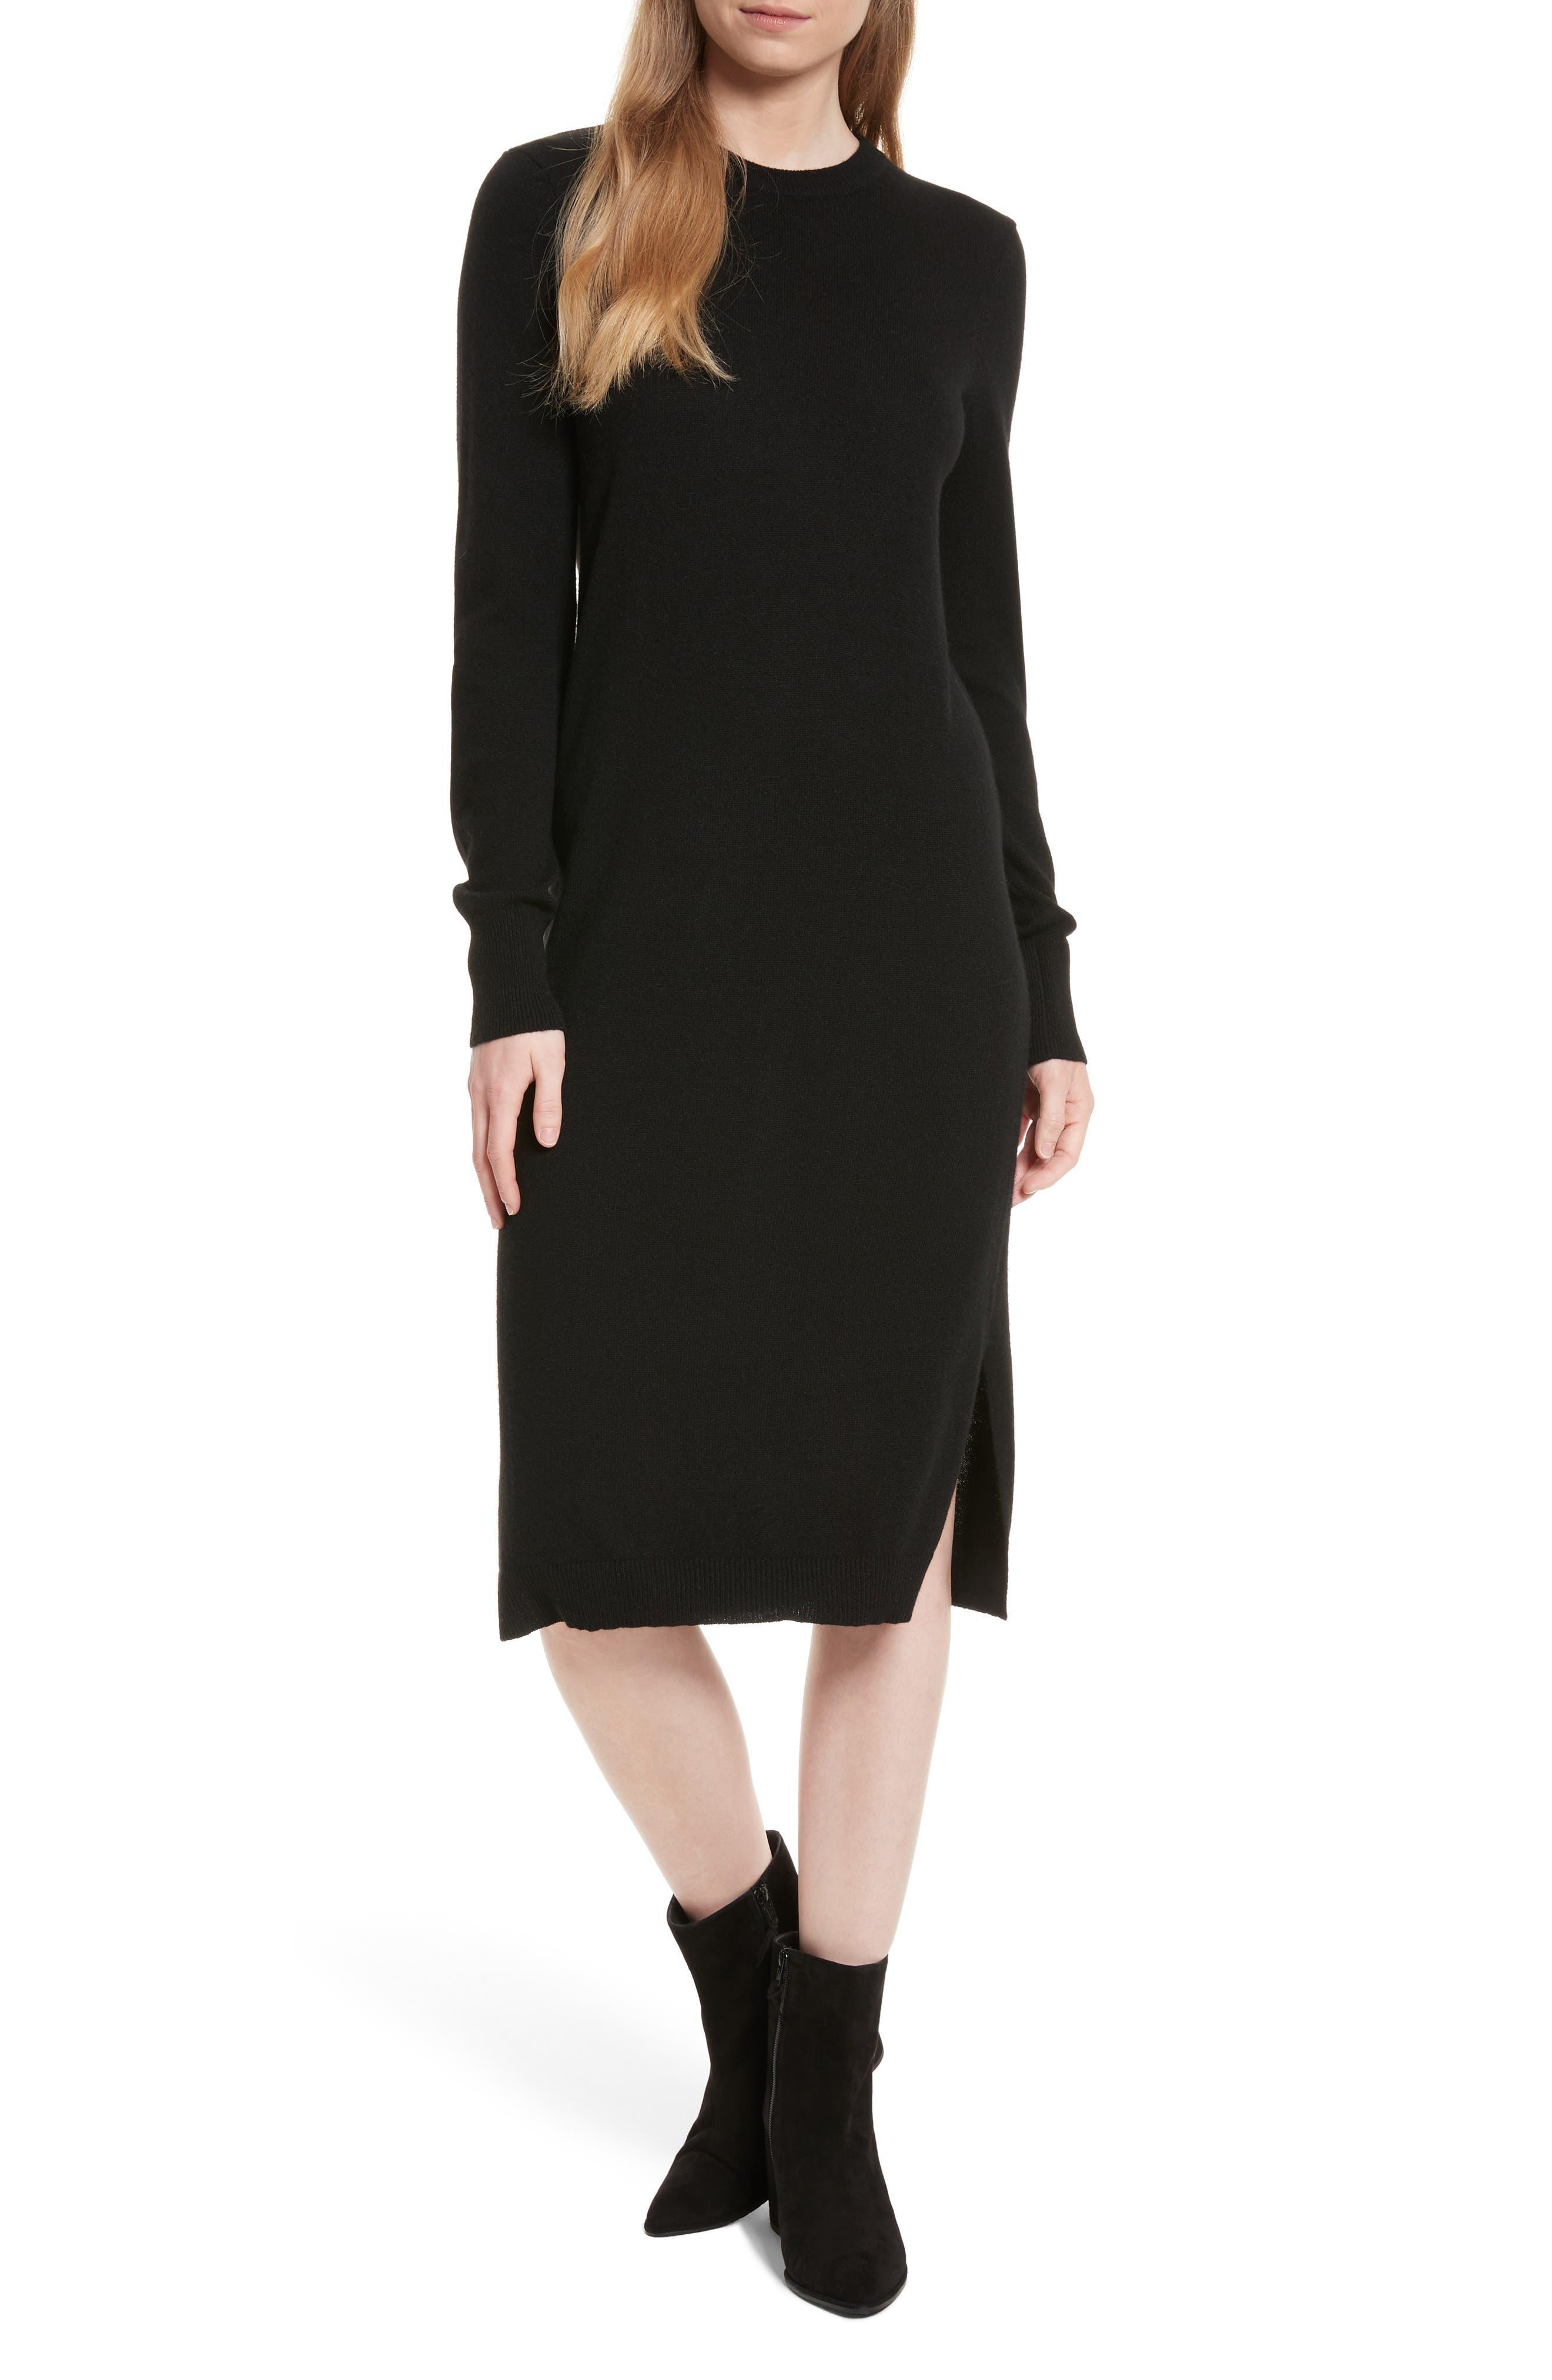 Main Image - Equipment Snyder Cashmere Knit Midi Dress